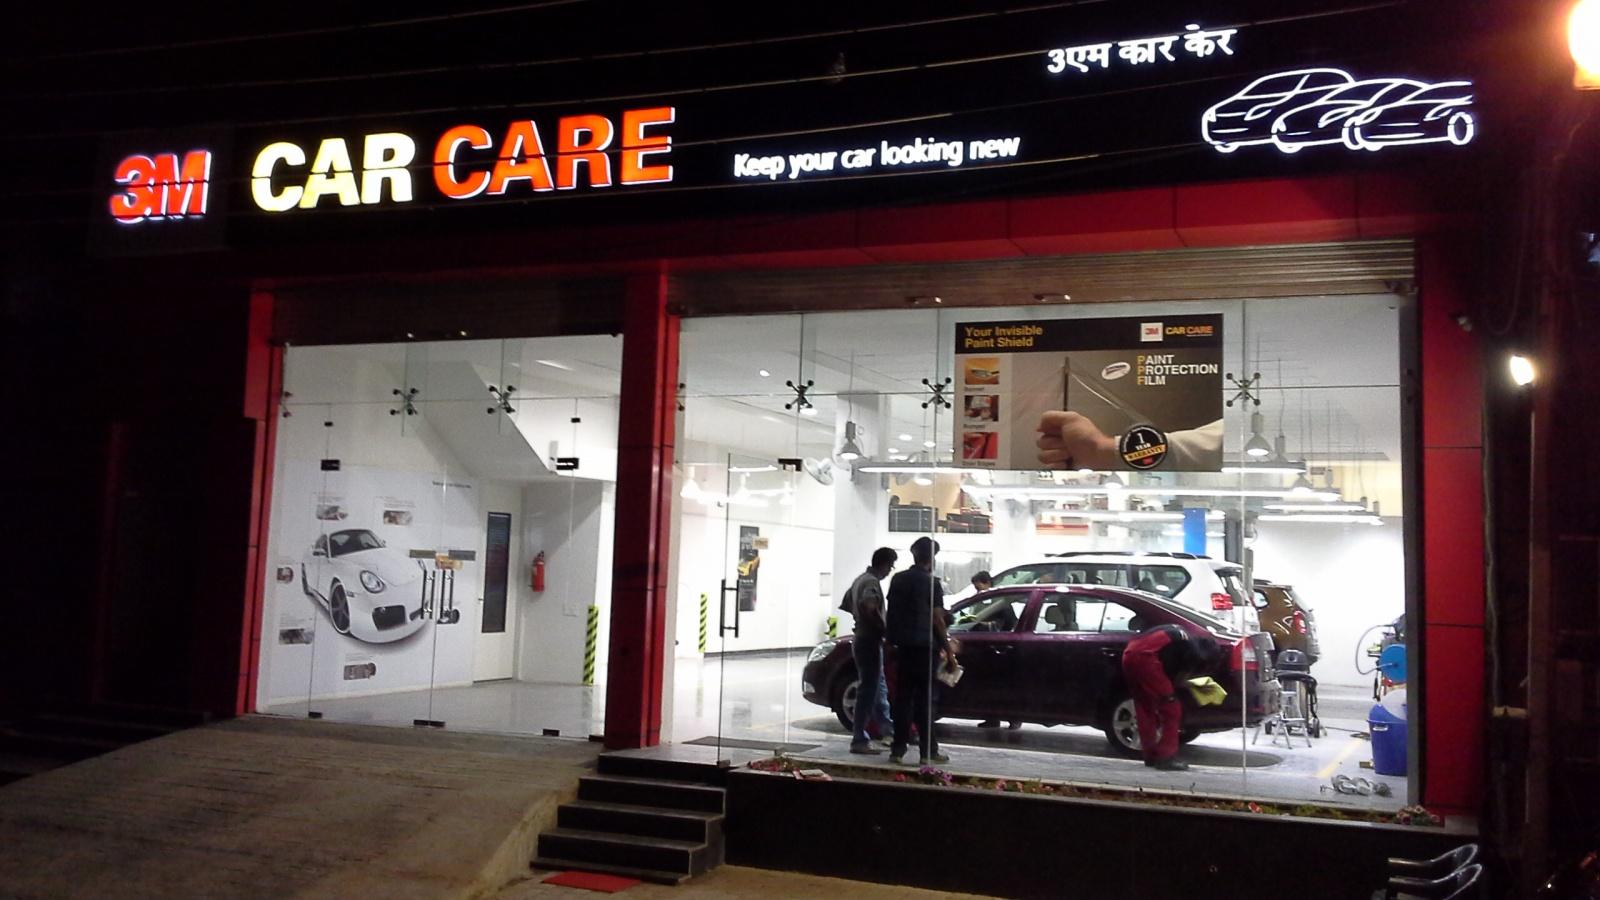 3M Car Care, Gurgaon - Scrutinized | India Travel Forum